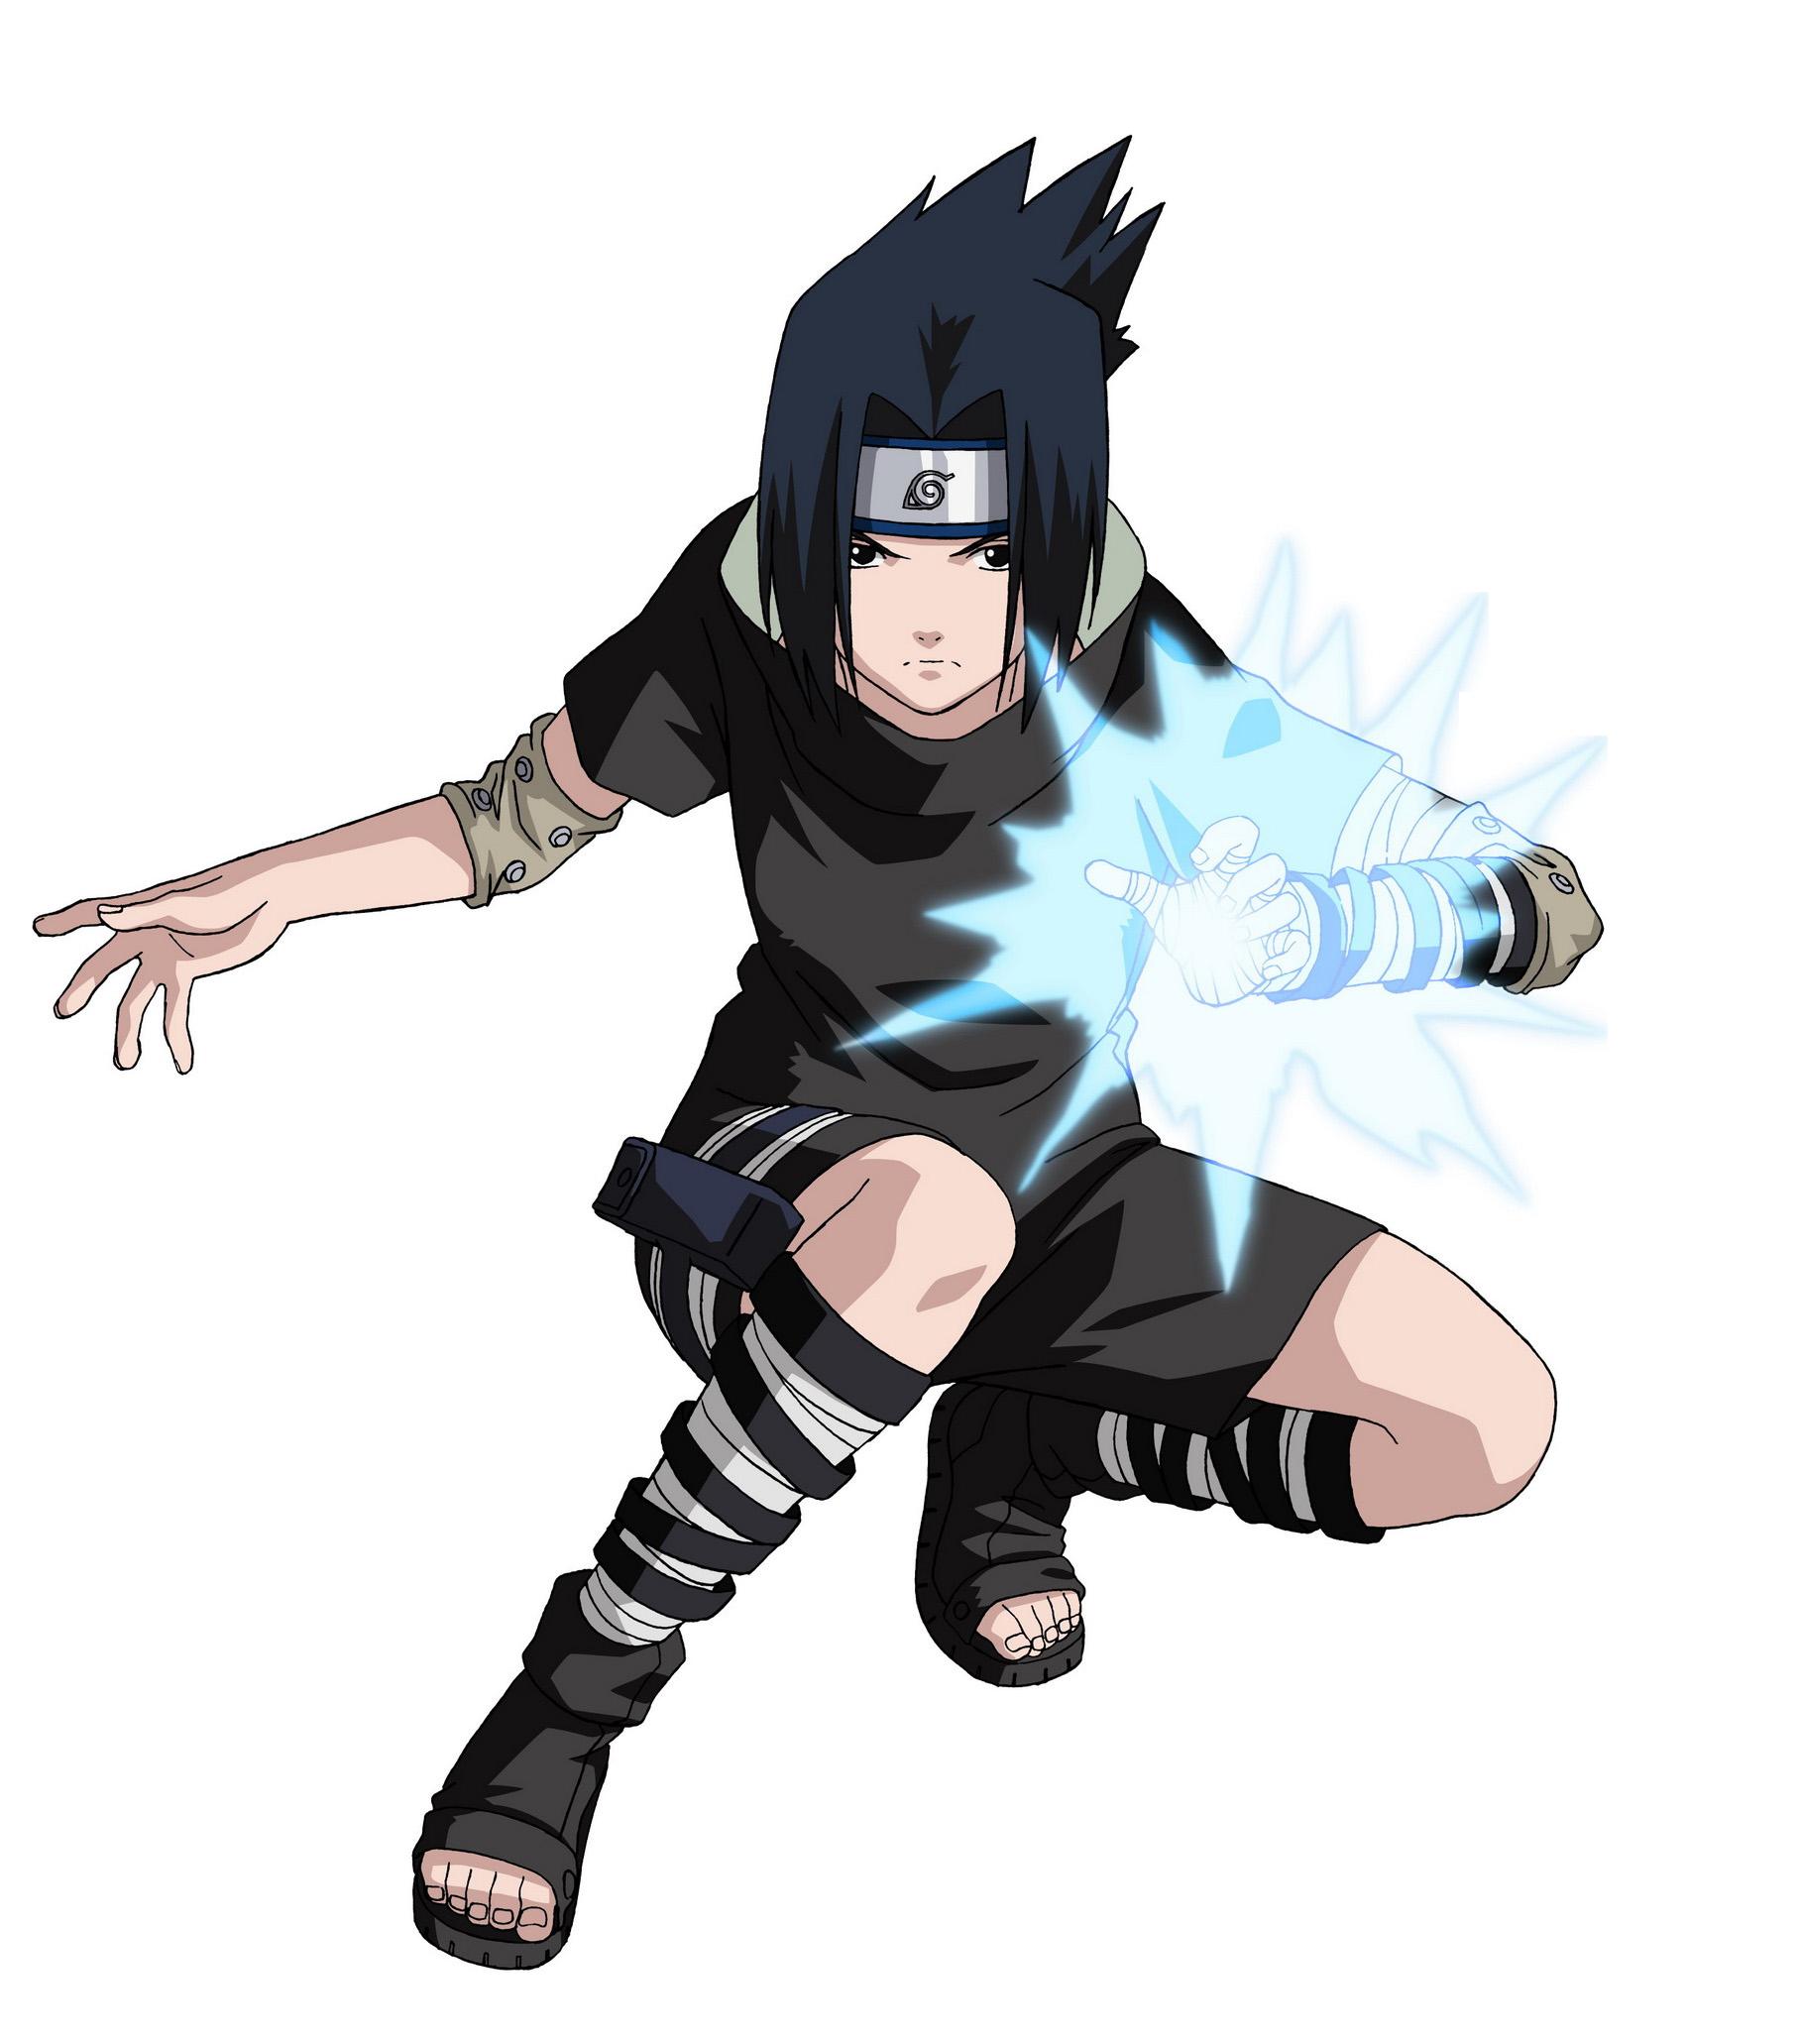 Sasuke Uchiha | Wiki Narutimate | Fandom powered by Wikia